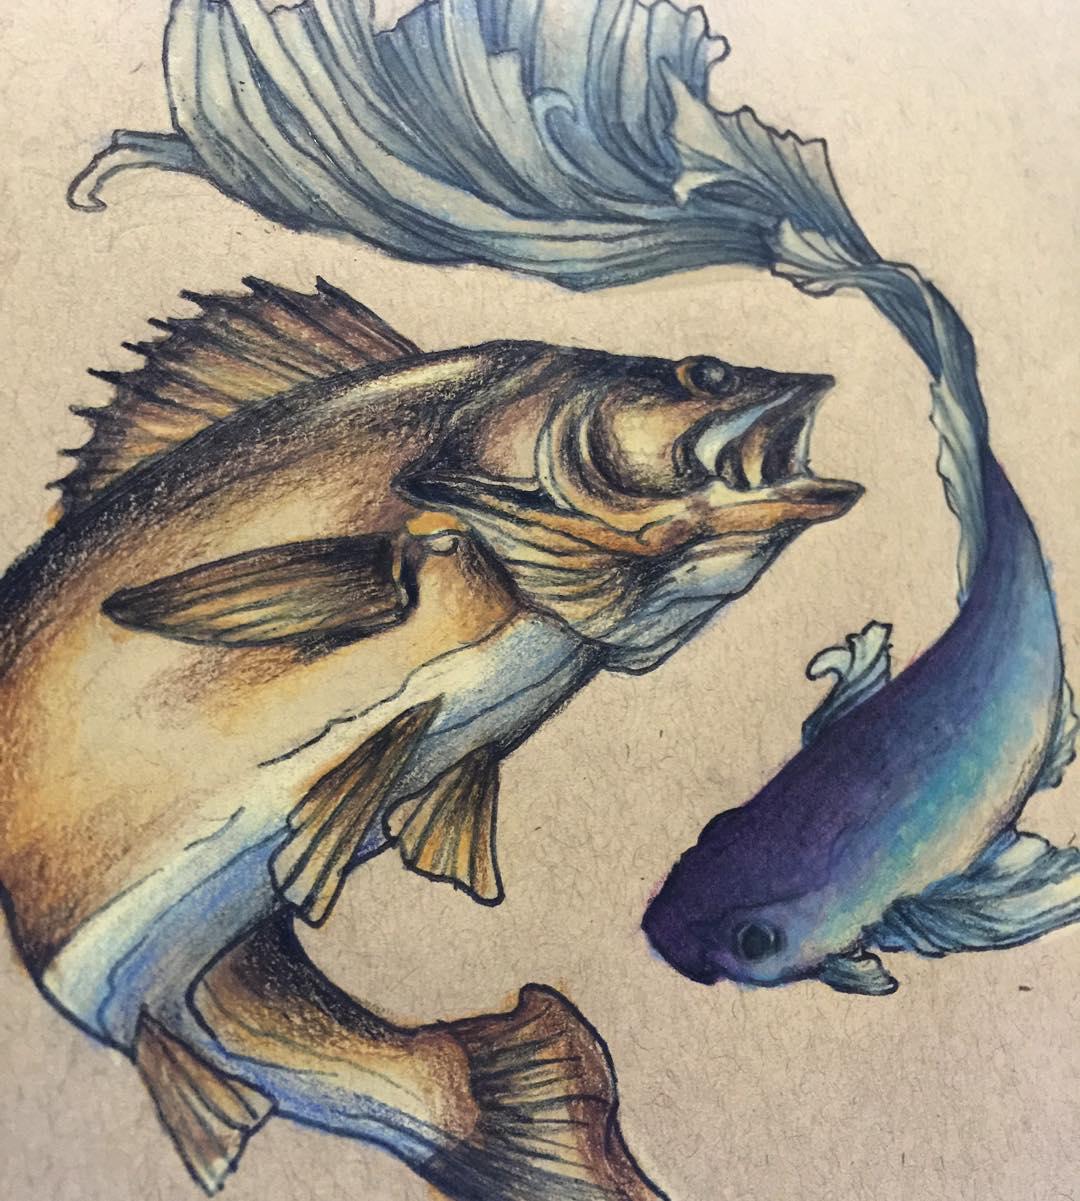 32 koi fish tattoo designs tattoo designs design trends. Black Bedroom Furniture Sets. Home Design Ideas